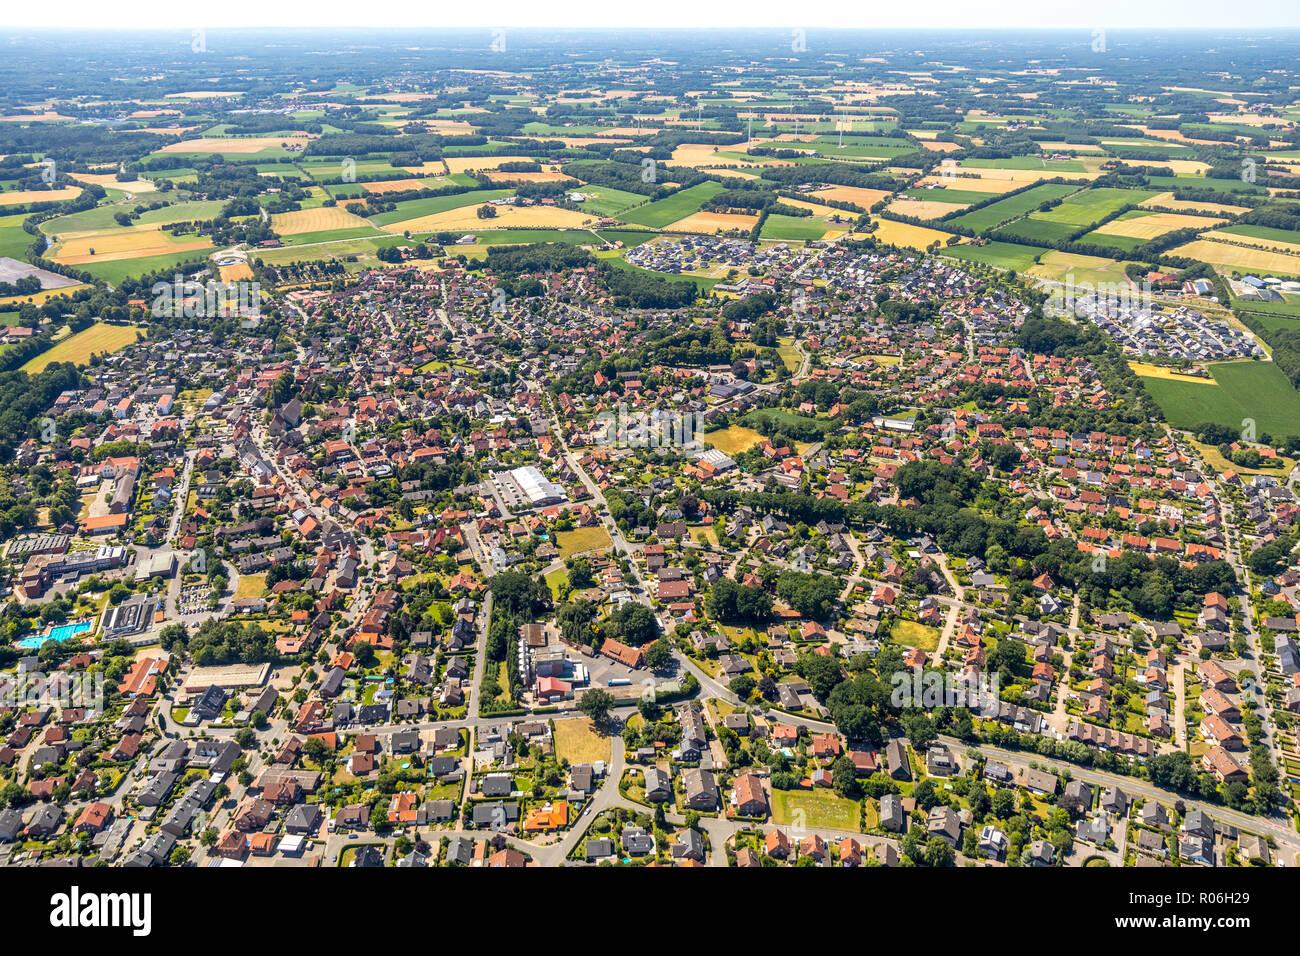 Aerial view, overview Ostbevern, Münsterland, North Rhine-Westphalia, Germany, Europe, Ostbevern, DEU, birds-eyes view, aerial view, aerial photograph - Stock Image